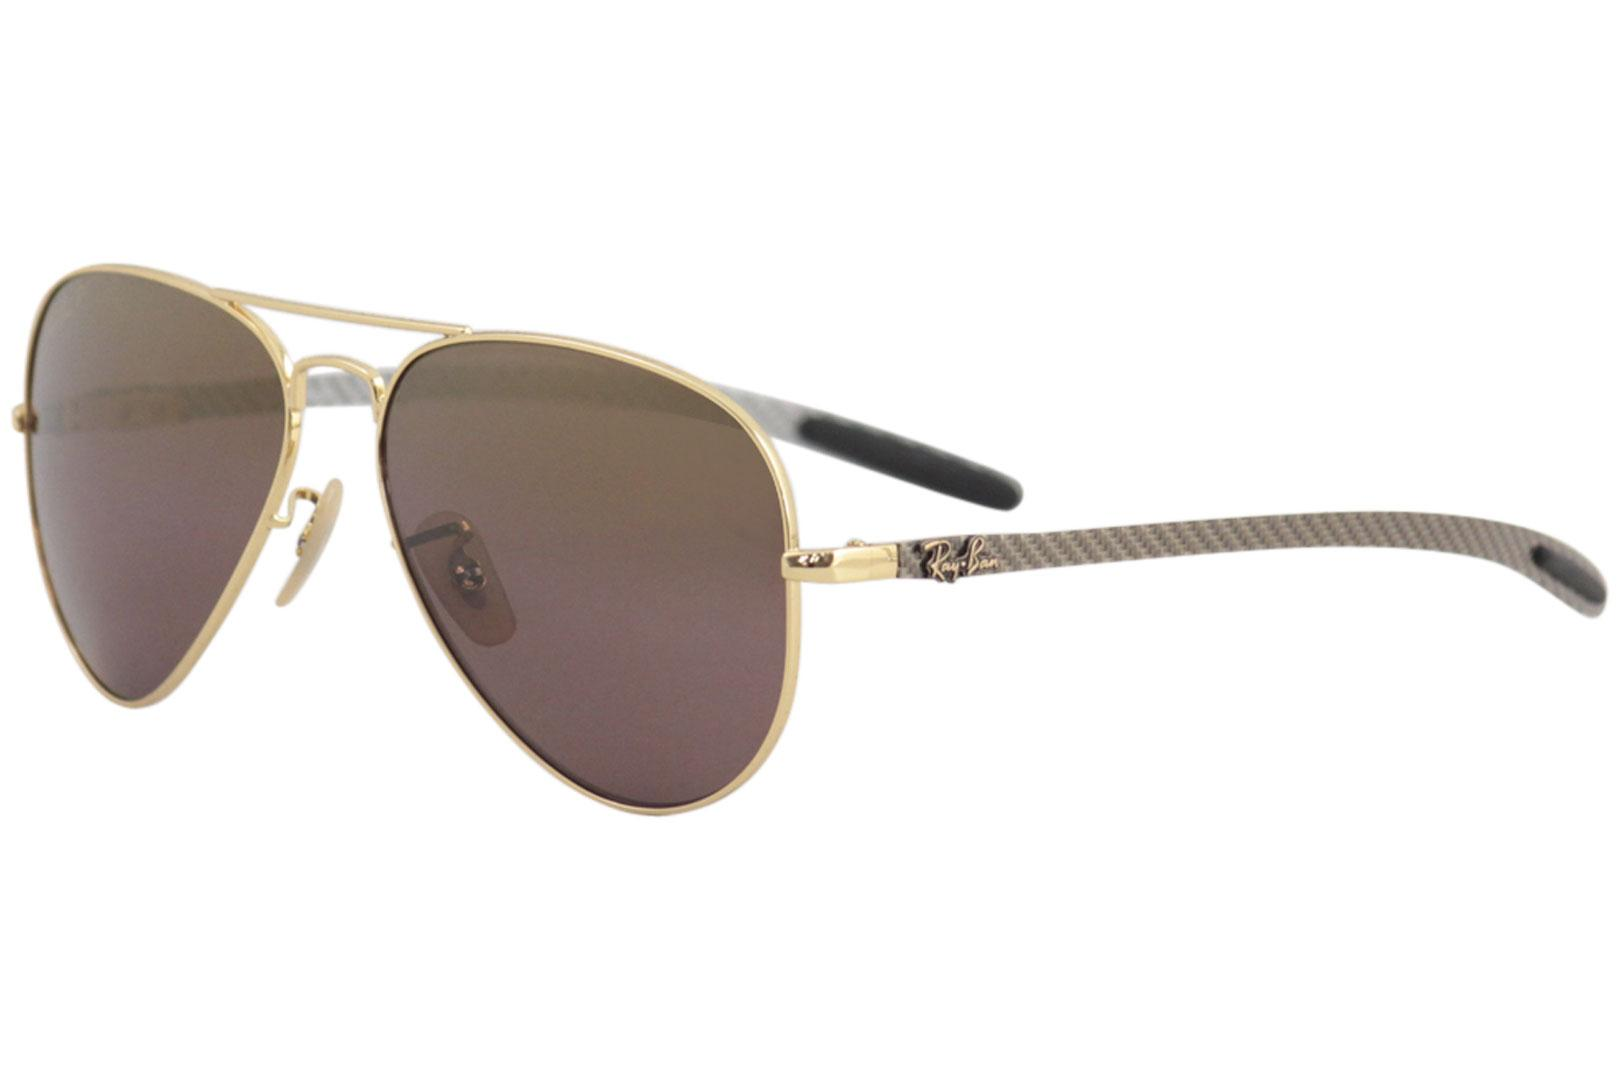 d1390096d5 Ray Ban Men's Chromance RB8317CH RB/8317/CH Pilot RayBan Polarized  Sunglasses